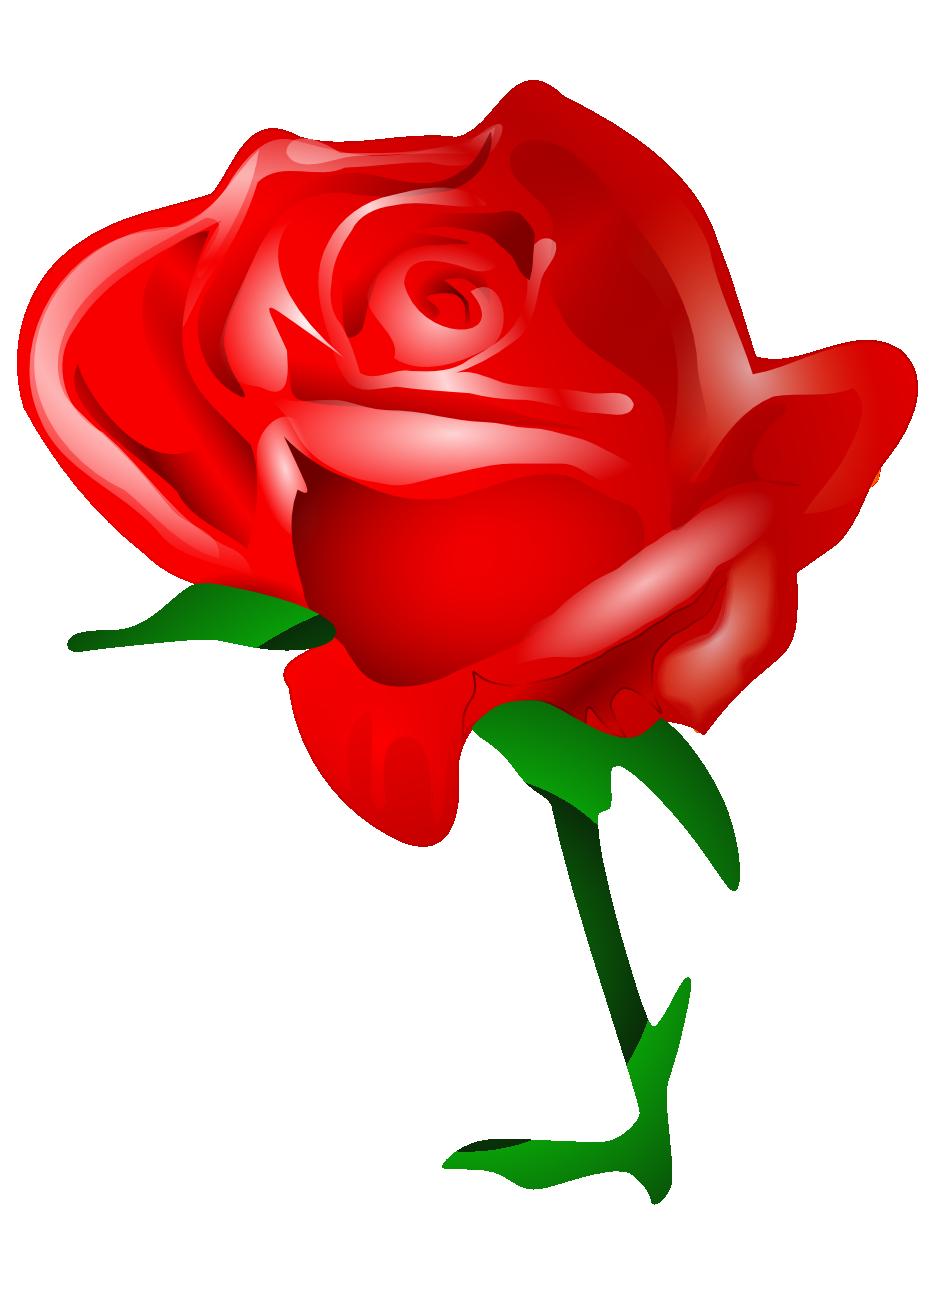 Rose flower clipart png clip art free Rose flower clipart png - ClipartFest clip art free